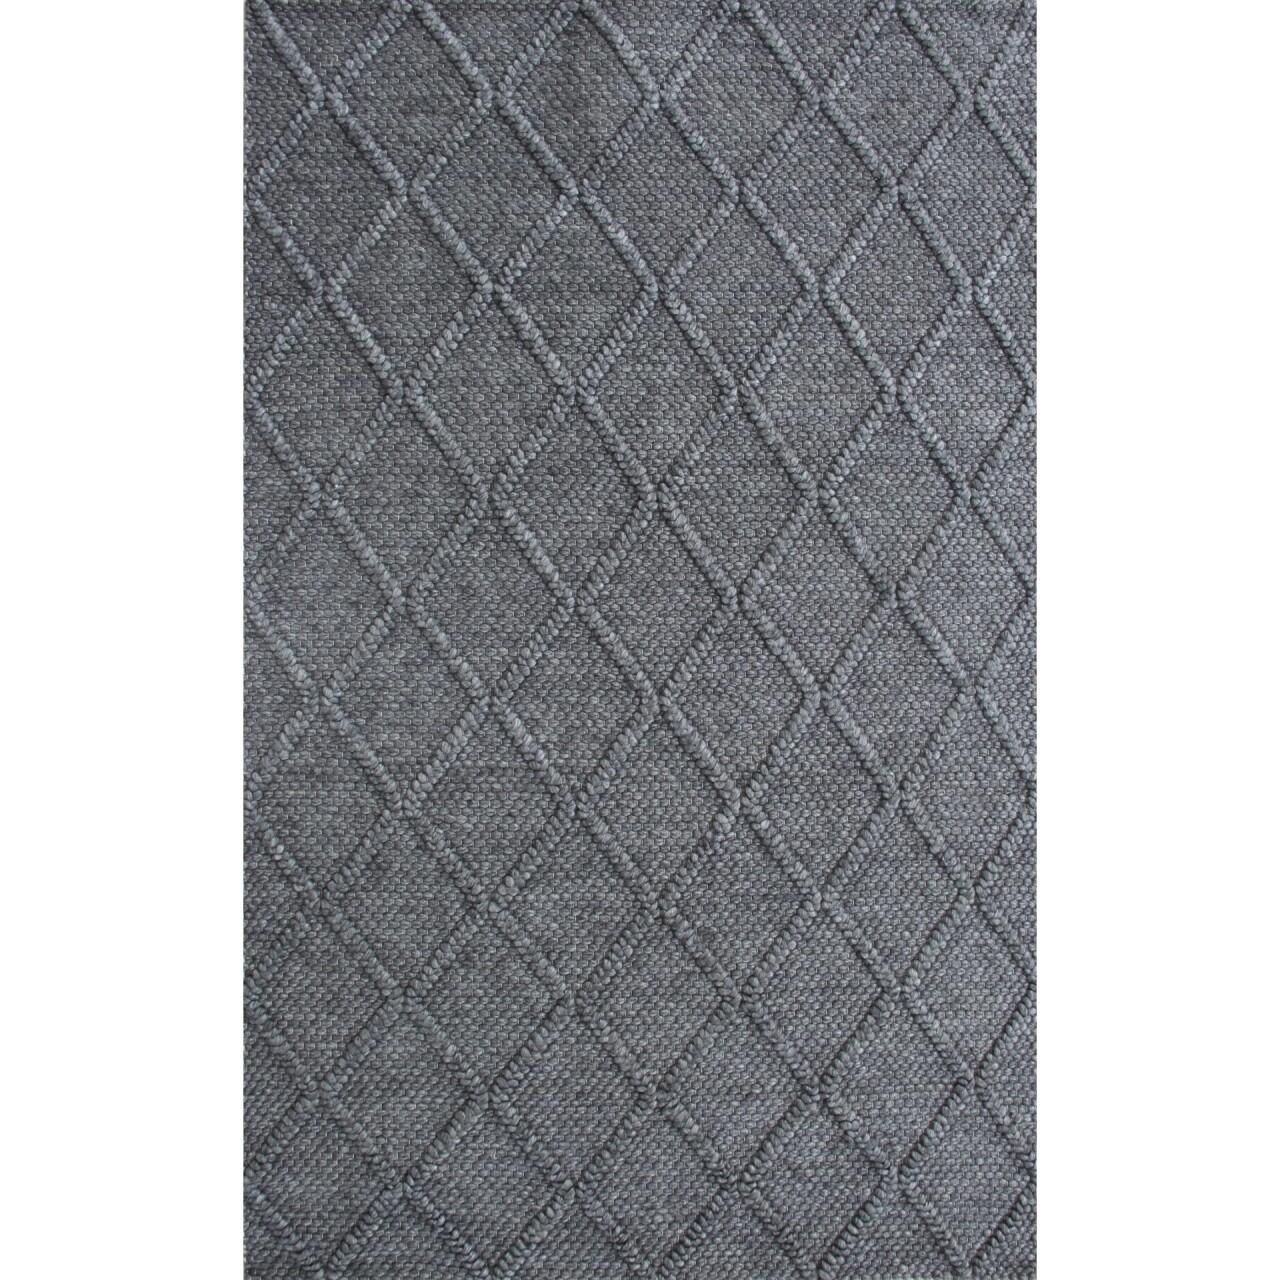 Covor rezistent Diamond - Anthracite, 130x190 cm